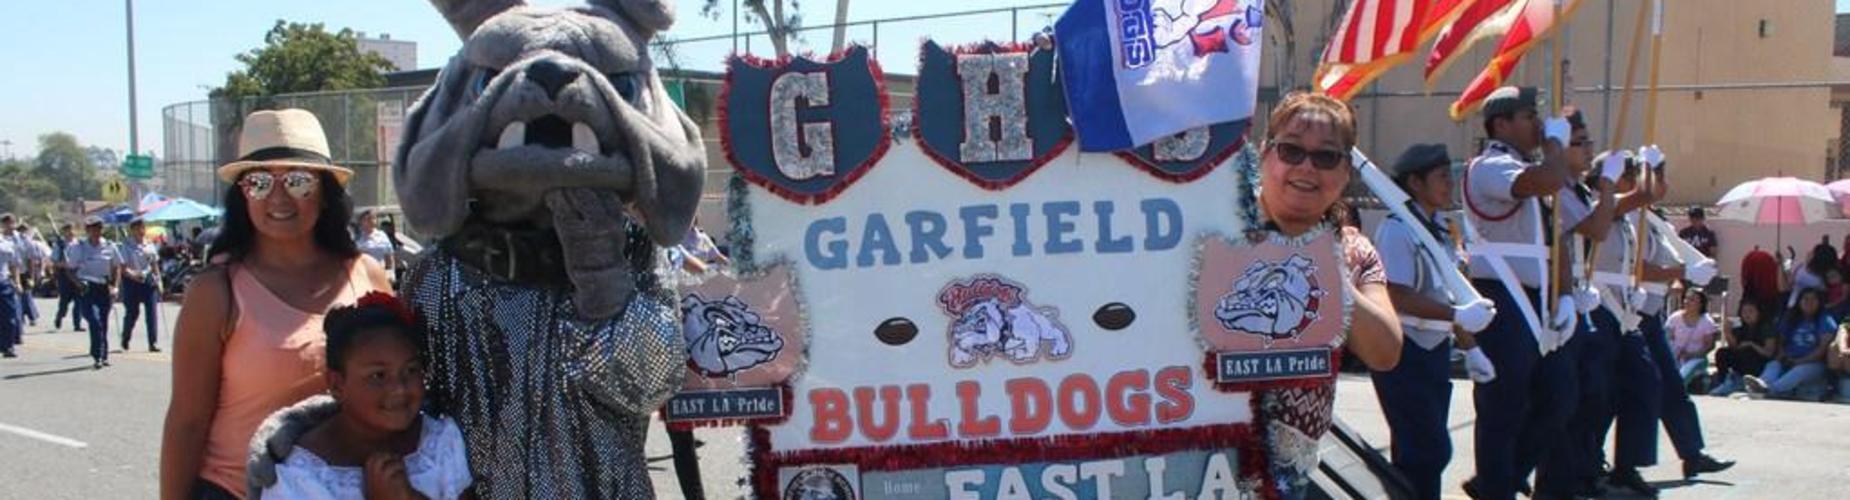 Garfield Senior High School